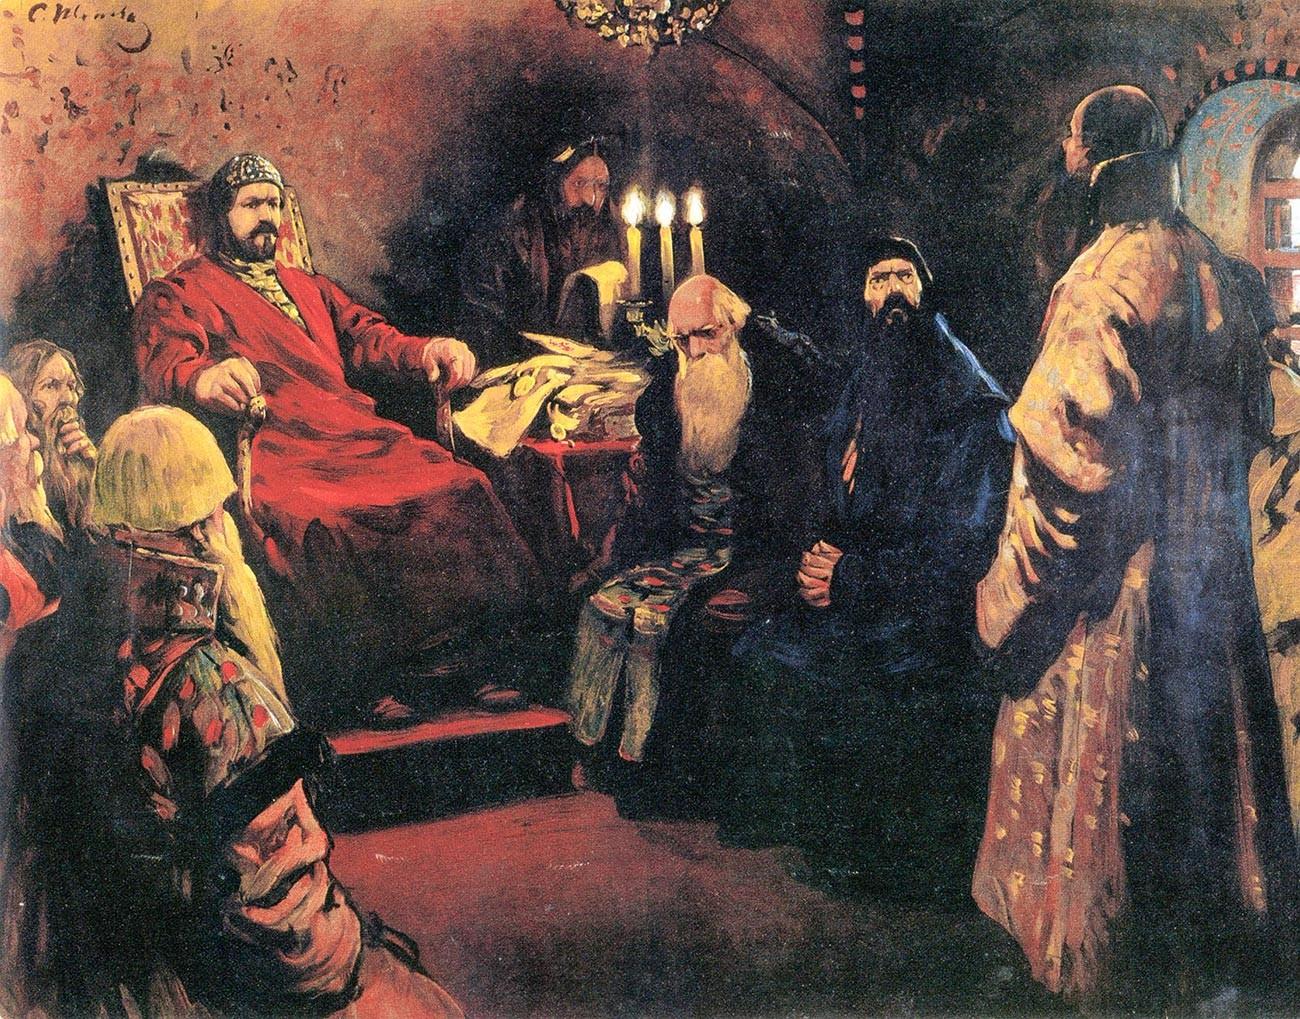 In 1566, Viskovatiy took part in the Zemsky Sobor (national assembly of the land).